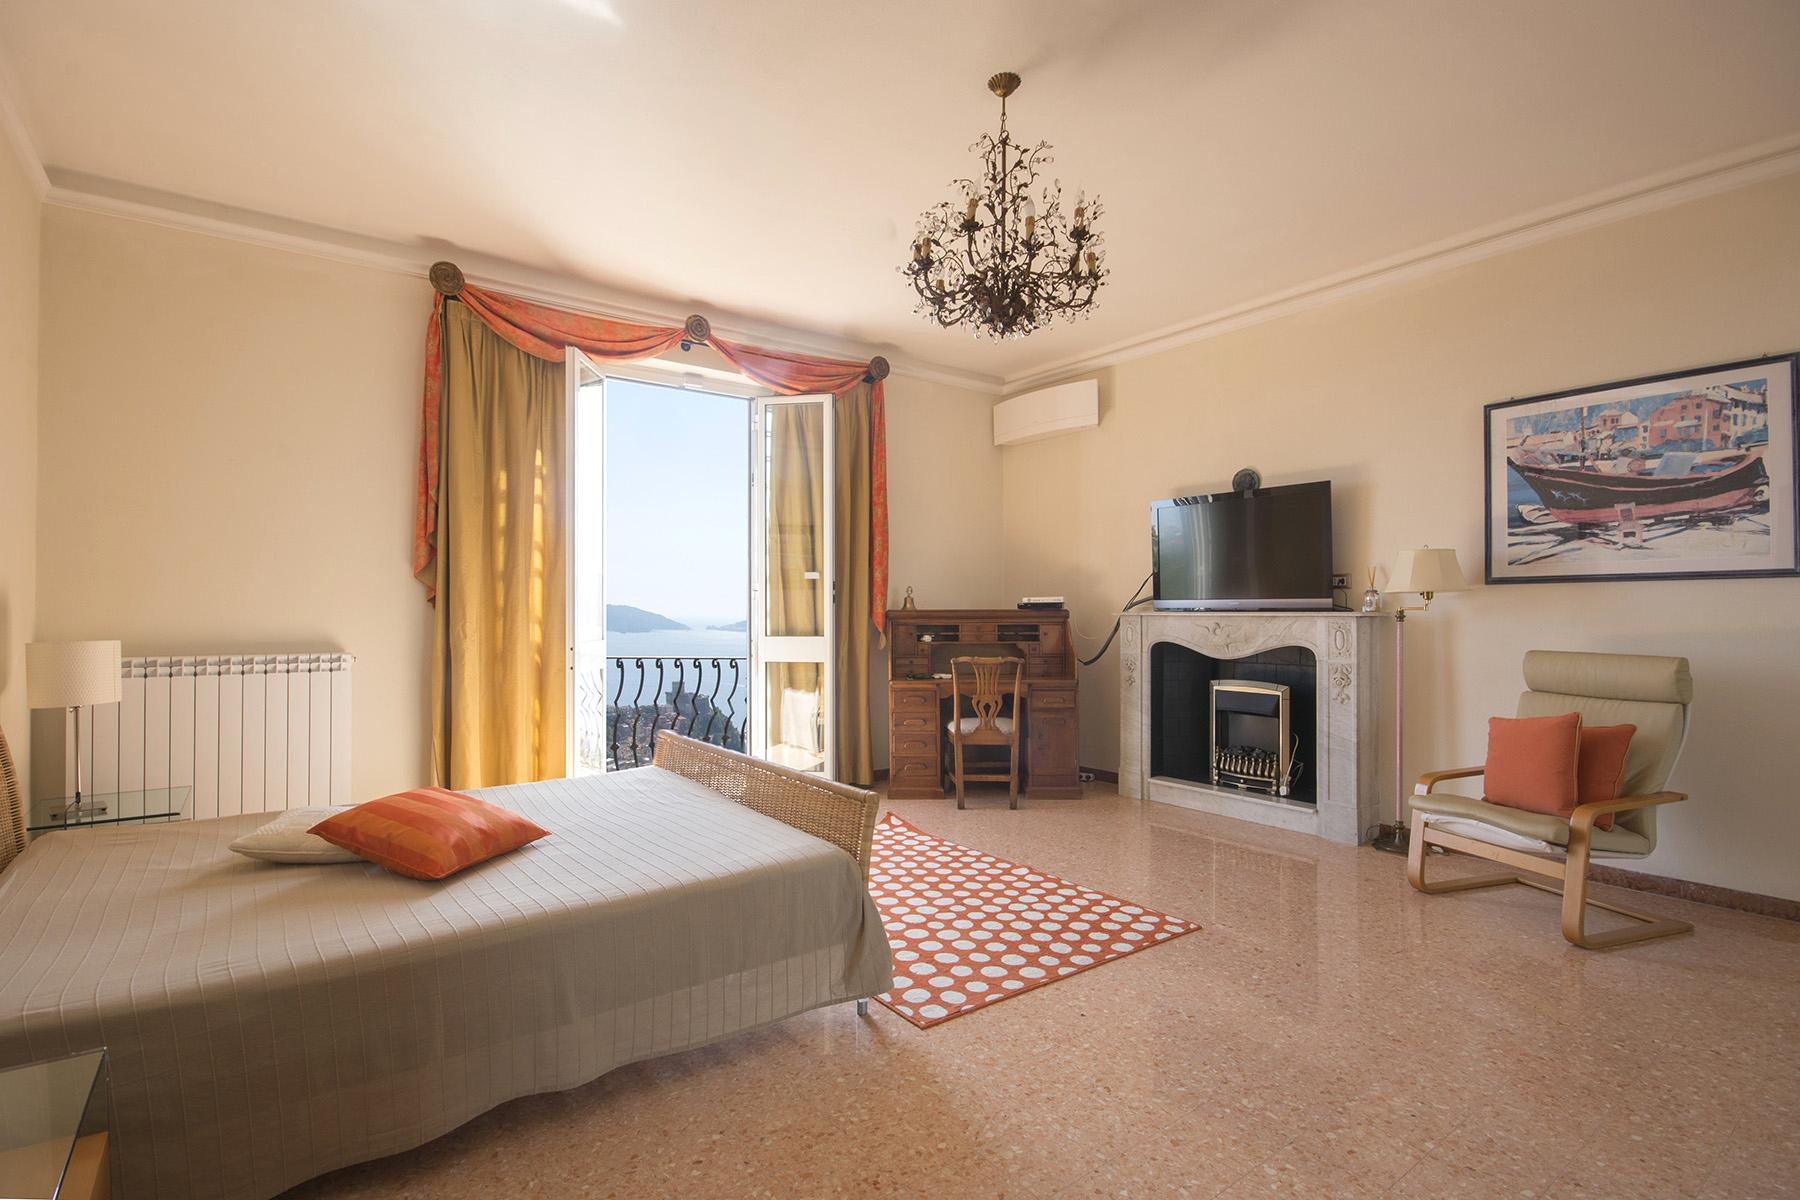 Villa in Vendita a Lerici: 5 locali, 580 mq - Foto 17